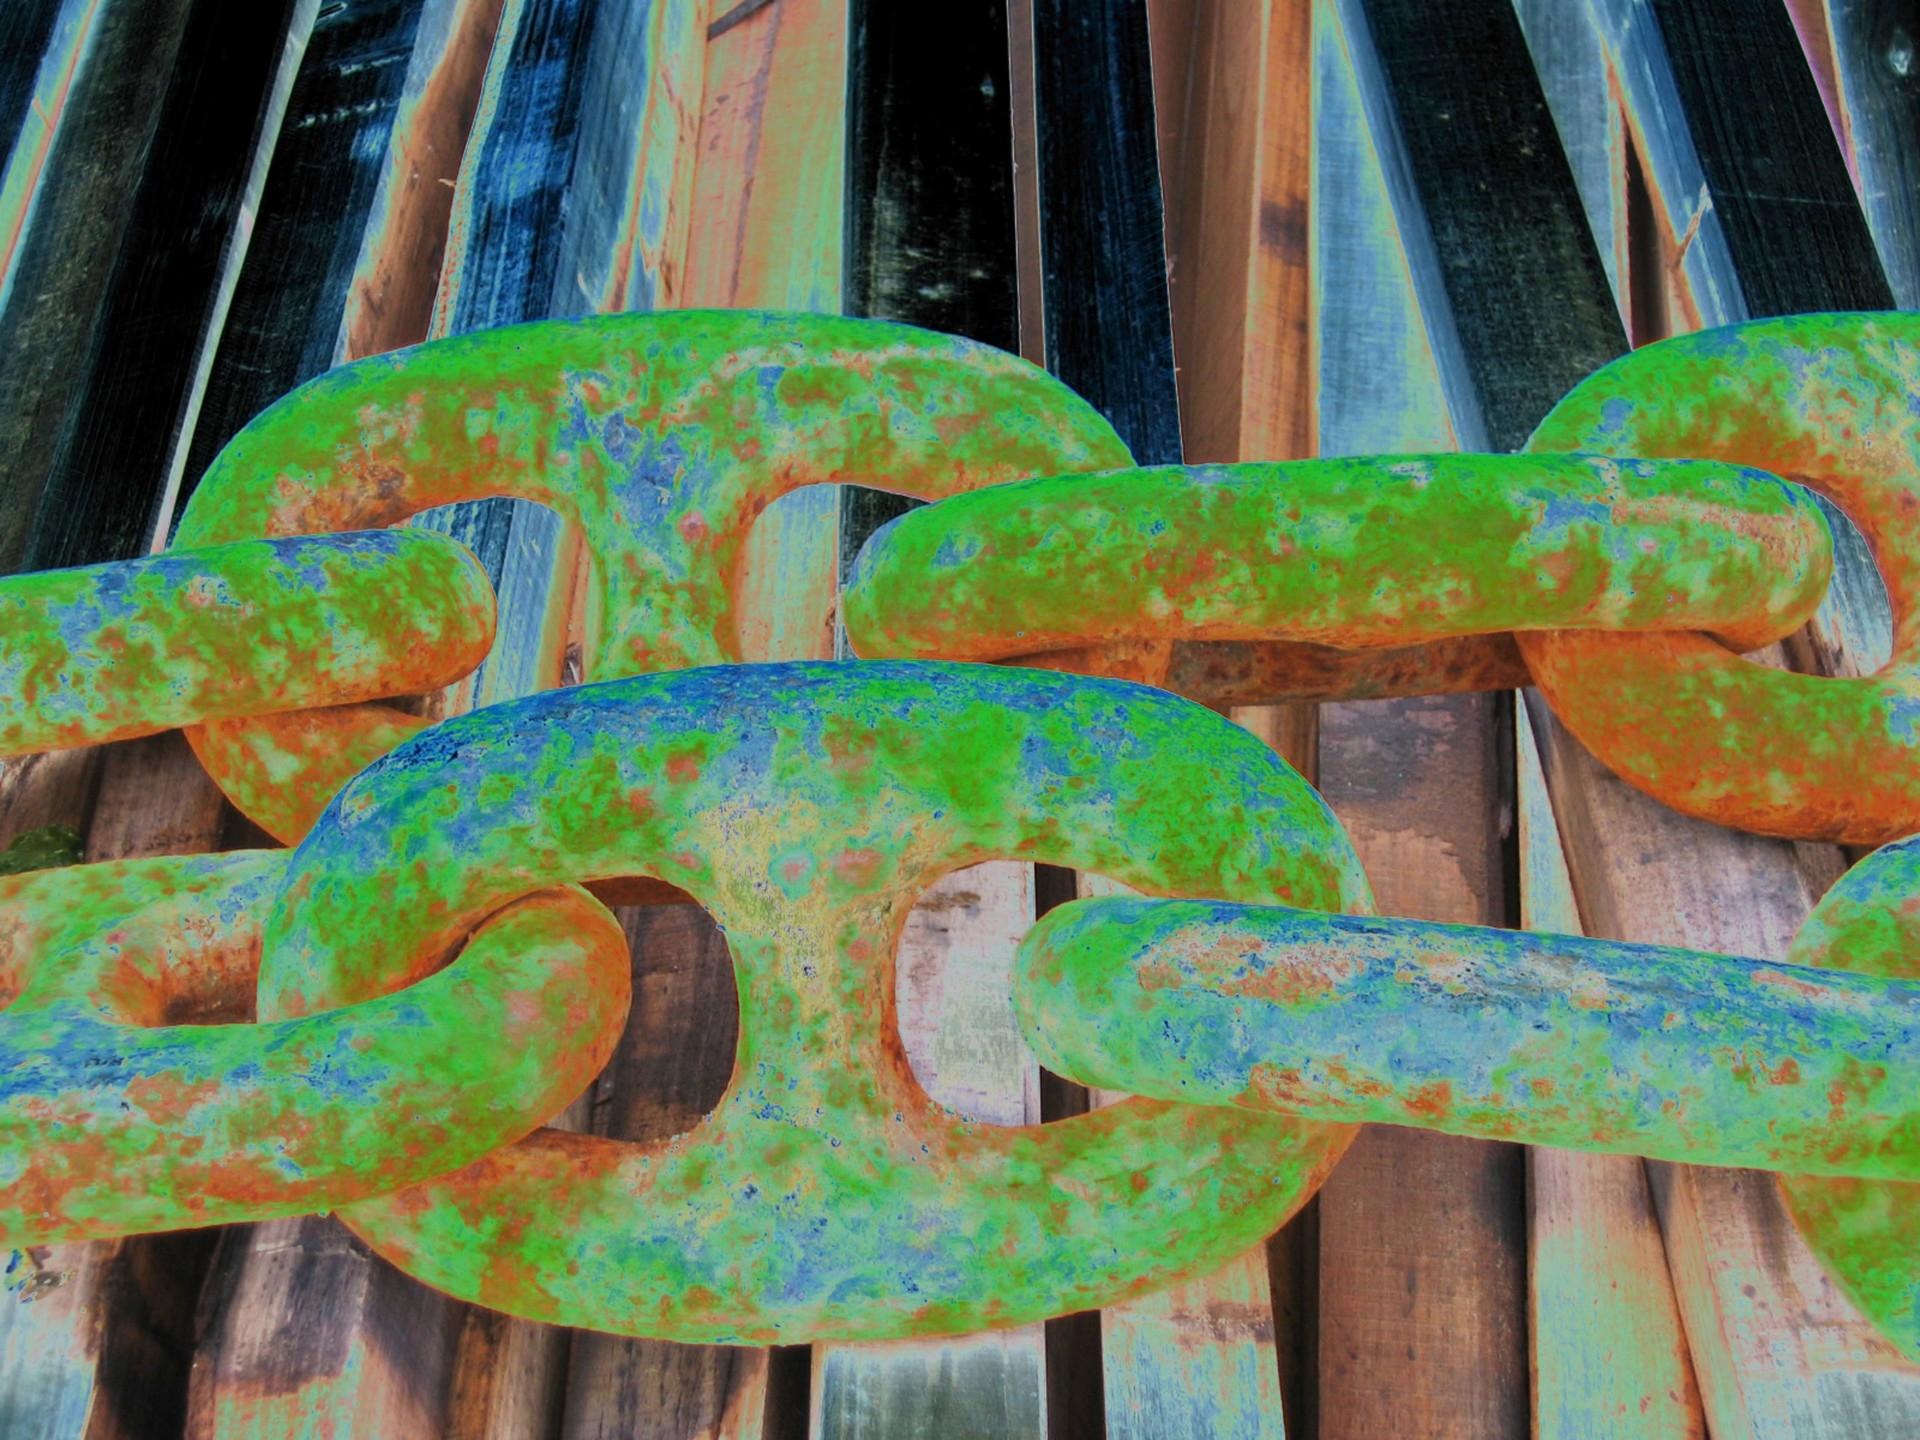 Ladislau da Regueira   Floating marine platform project # Bow chain (2008)